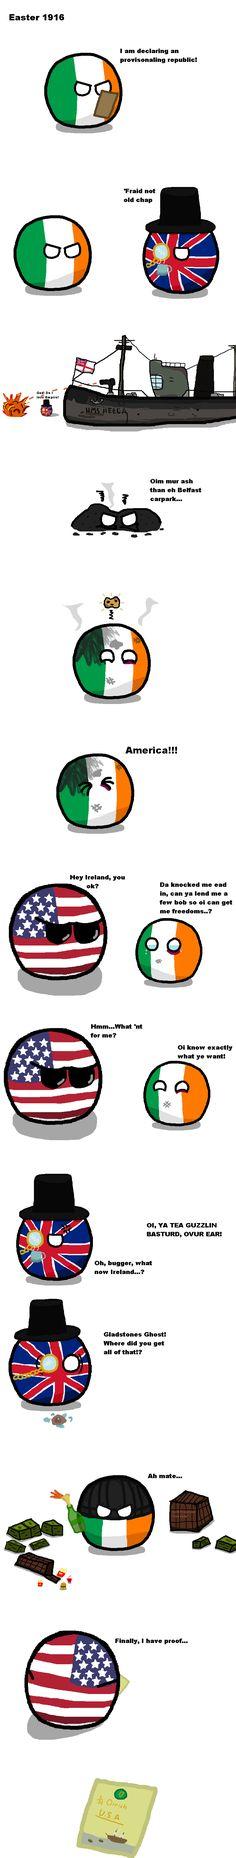 Hibernian Bloodredditormade ( Ireland, UK, USA ) by Blackfire853  #polandball #countryball